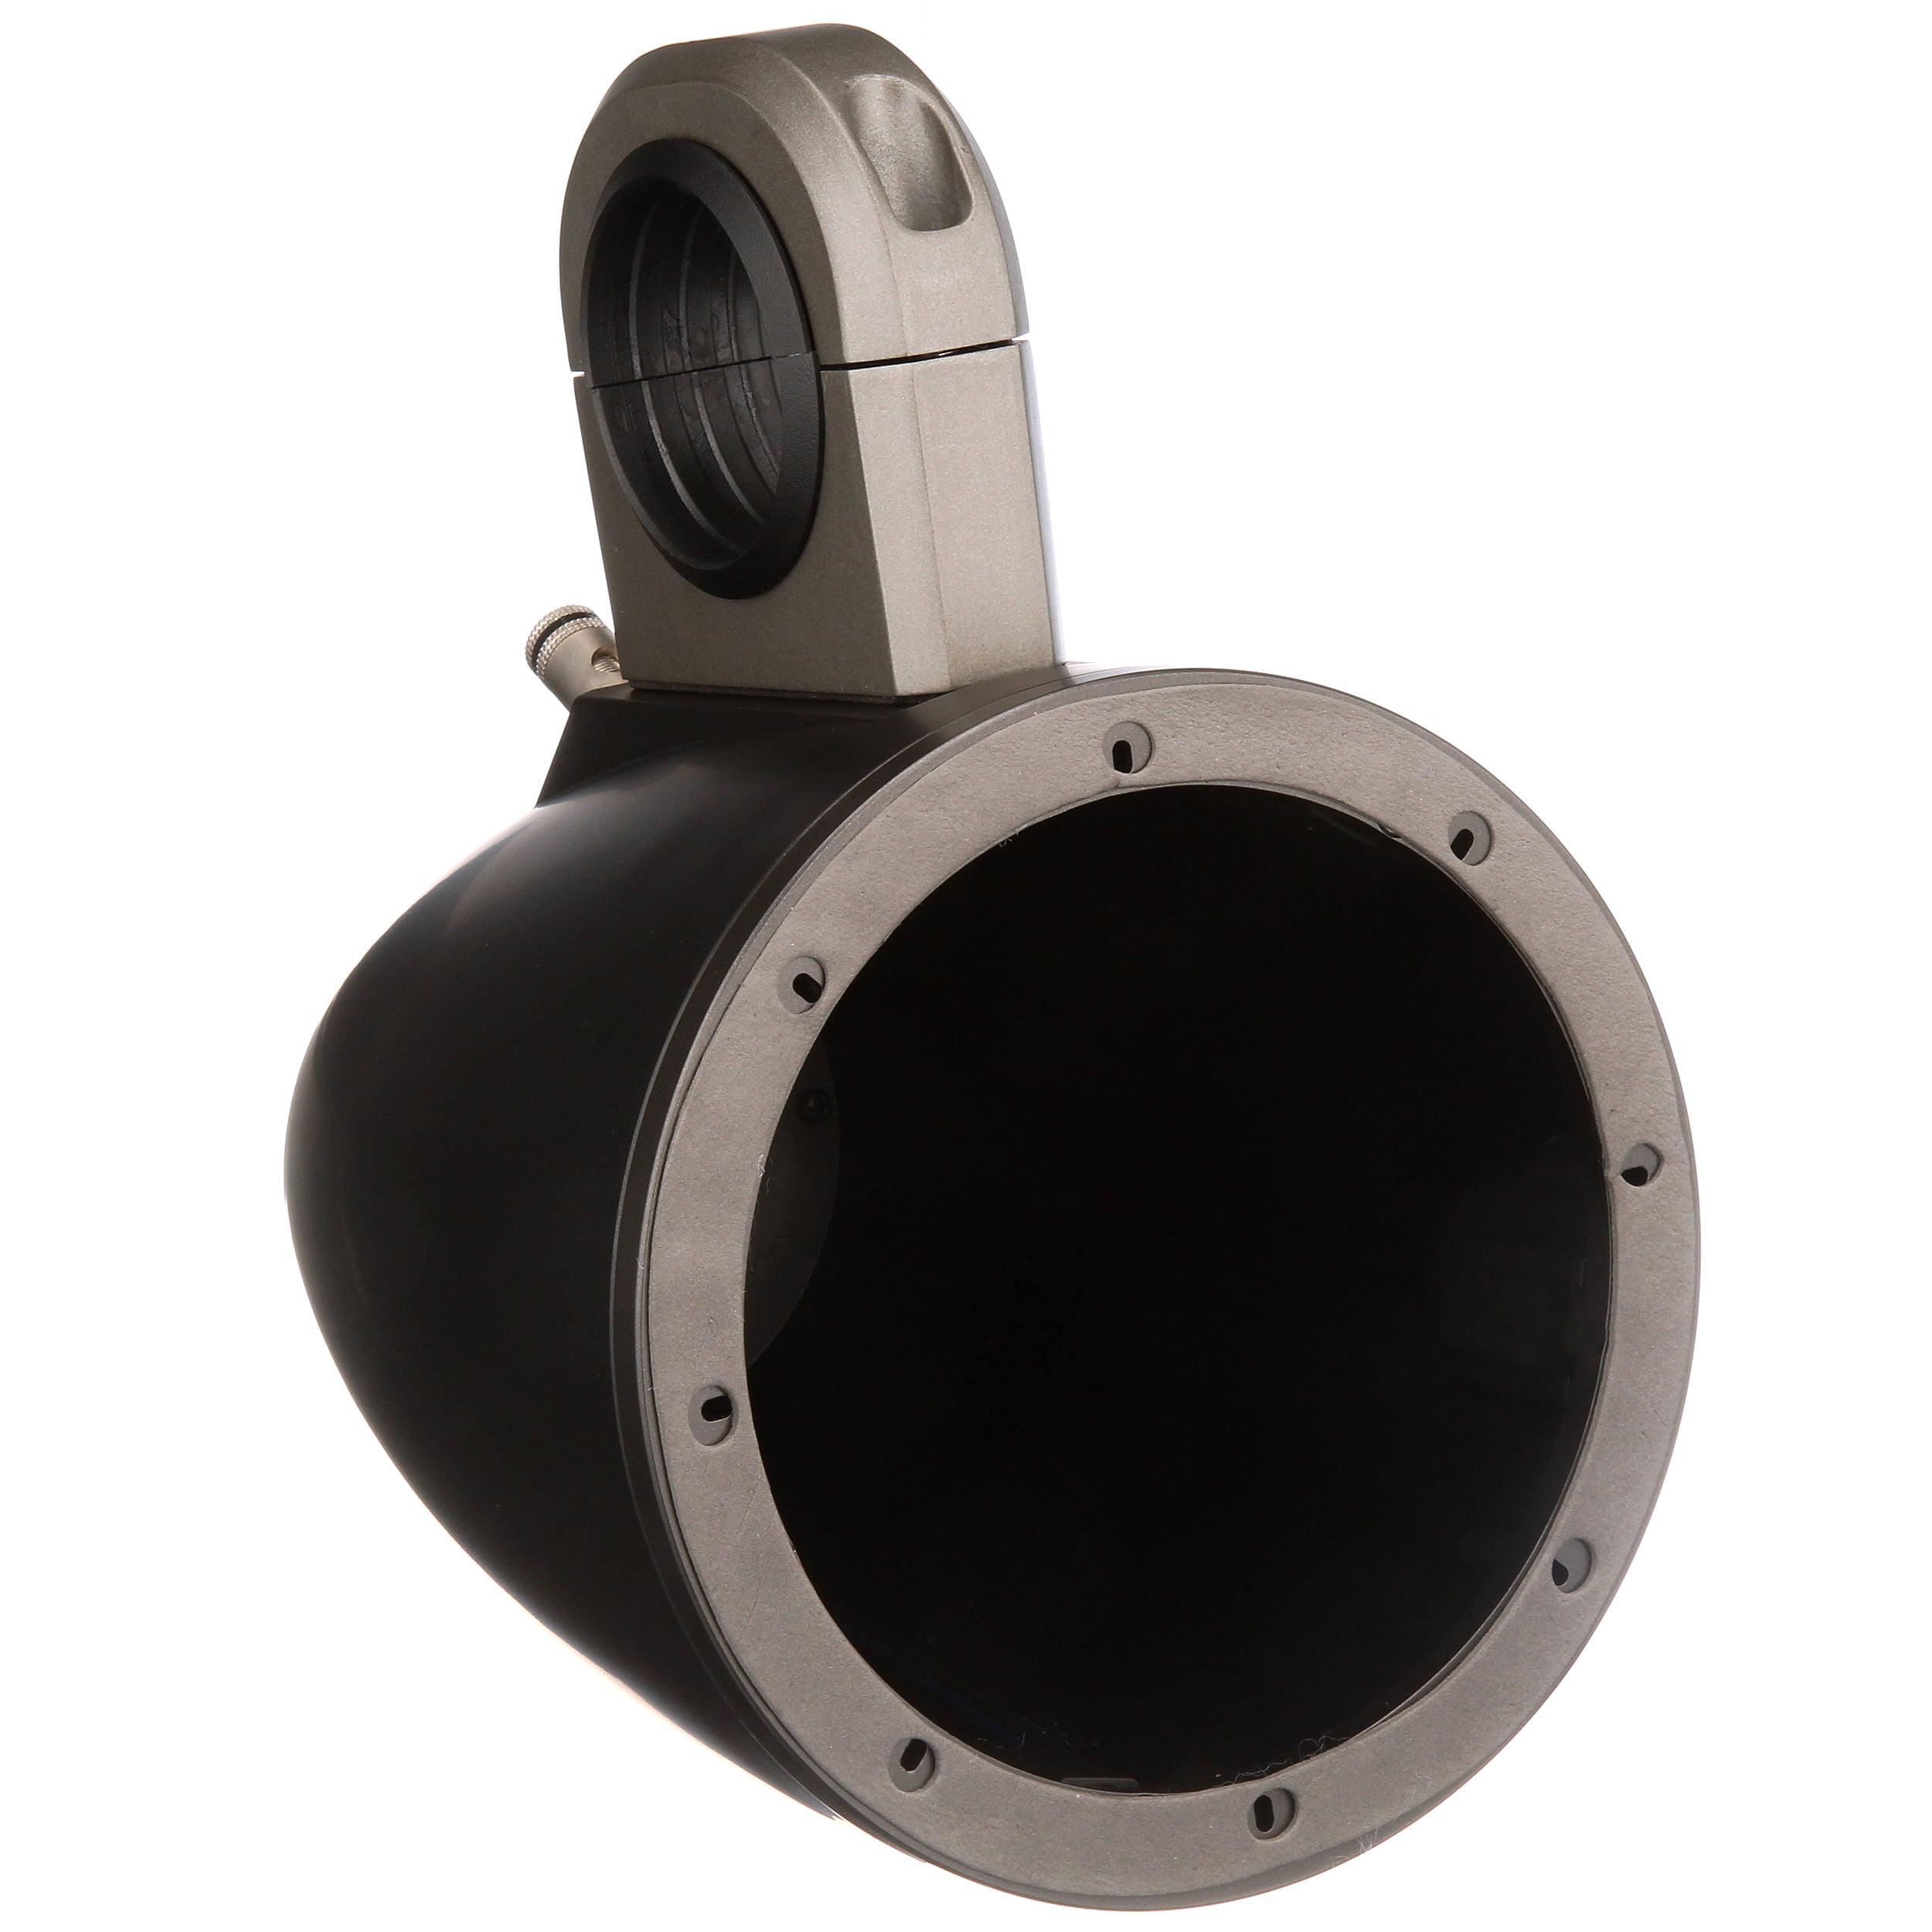 2 Kicker 12KMTED 6.5 Dual Marine Weather-Proof Speakers Tower Empty Enclosures